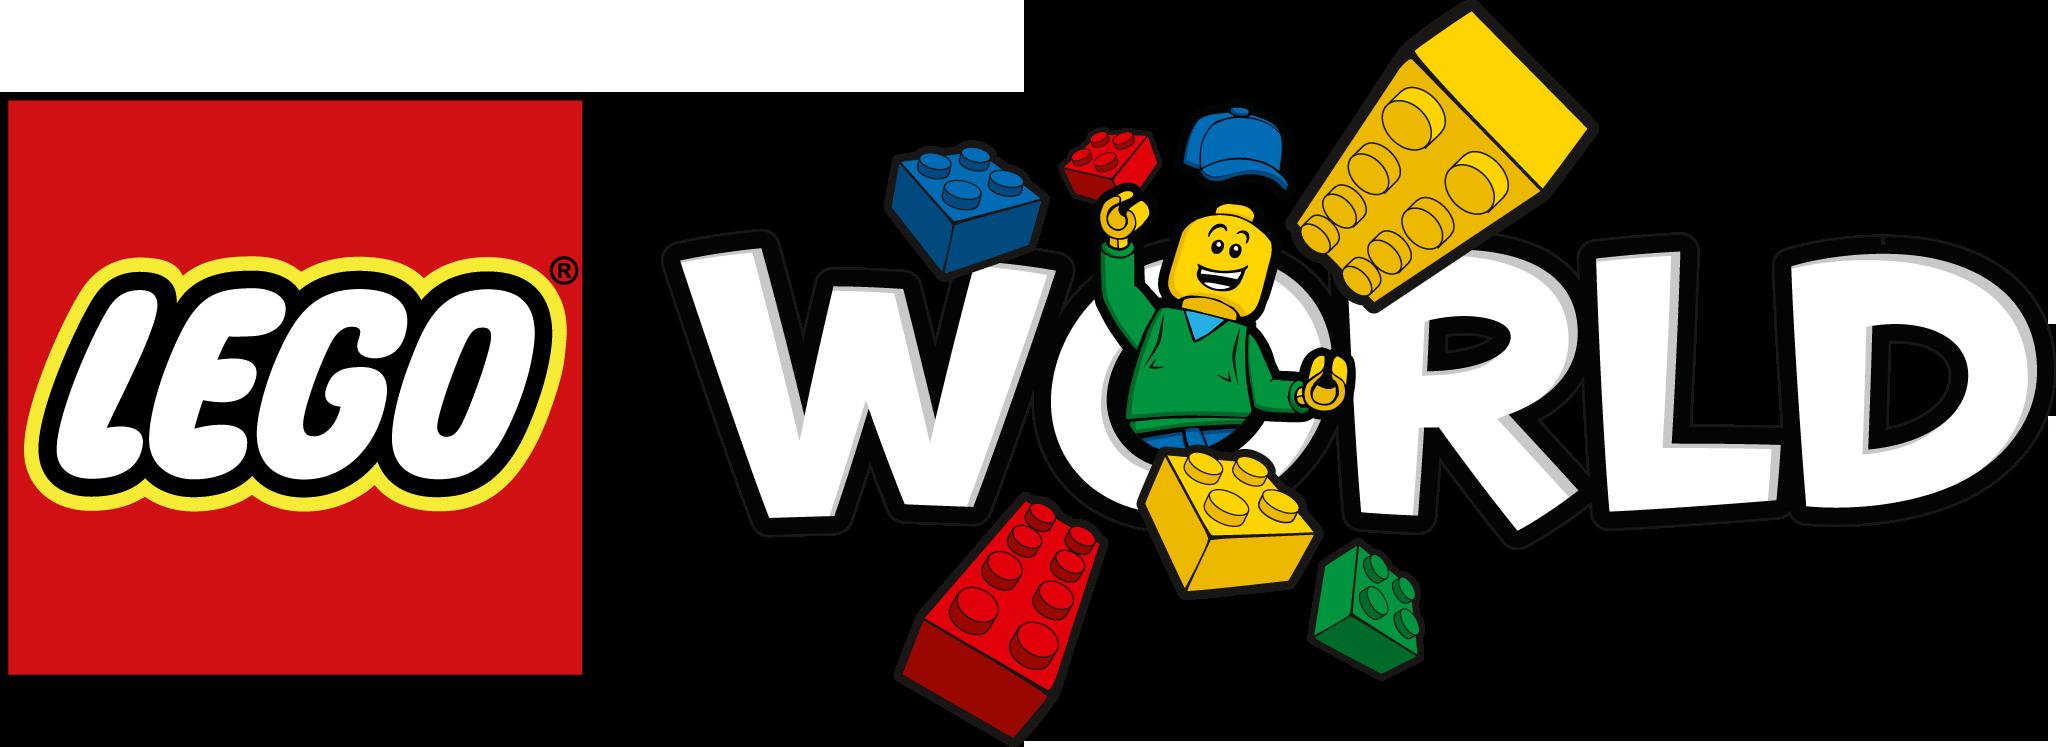 Картинки значок лего